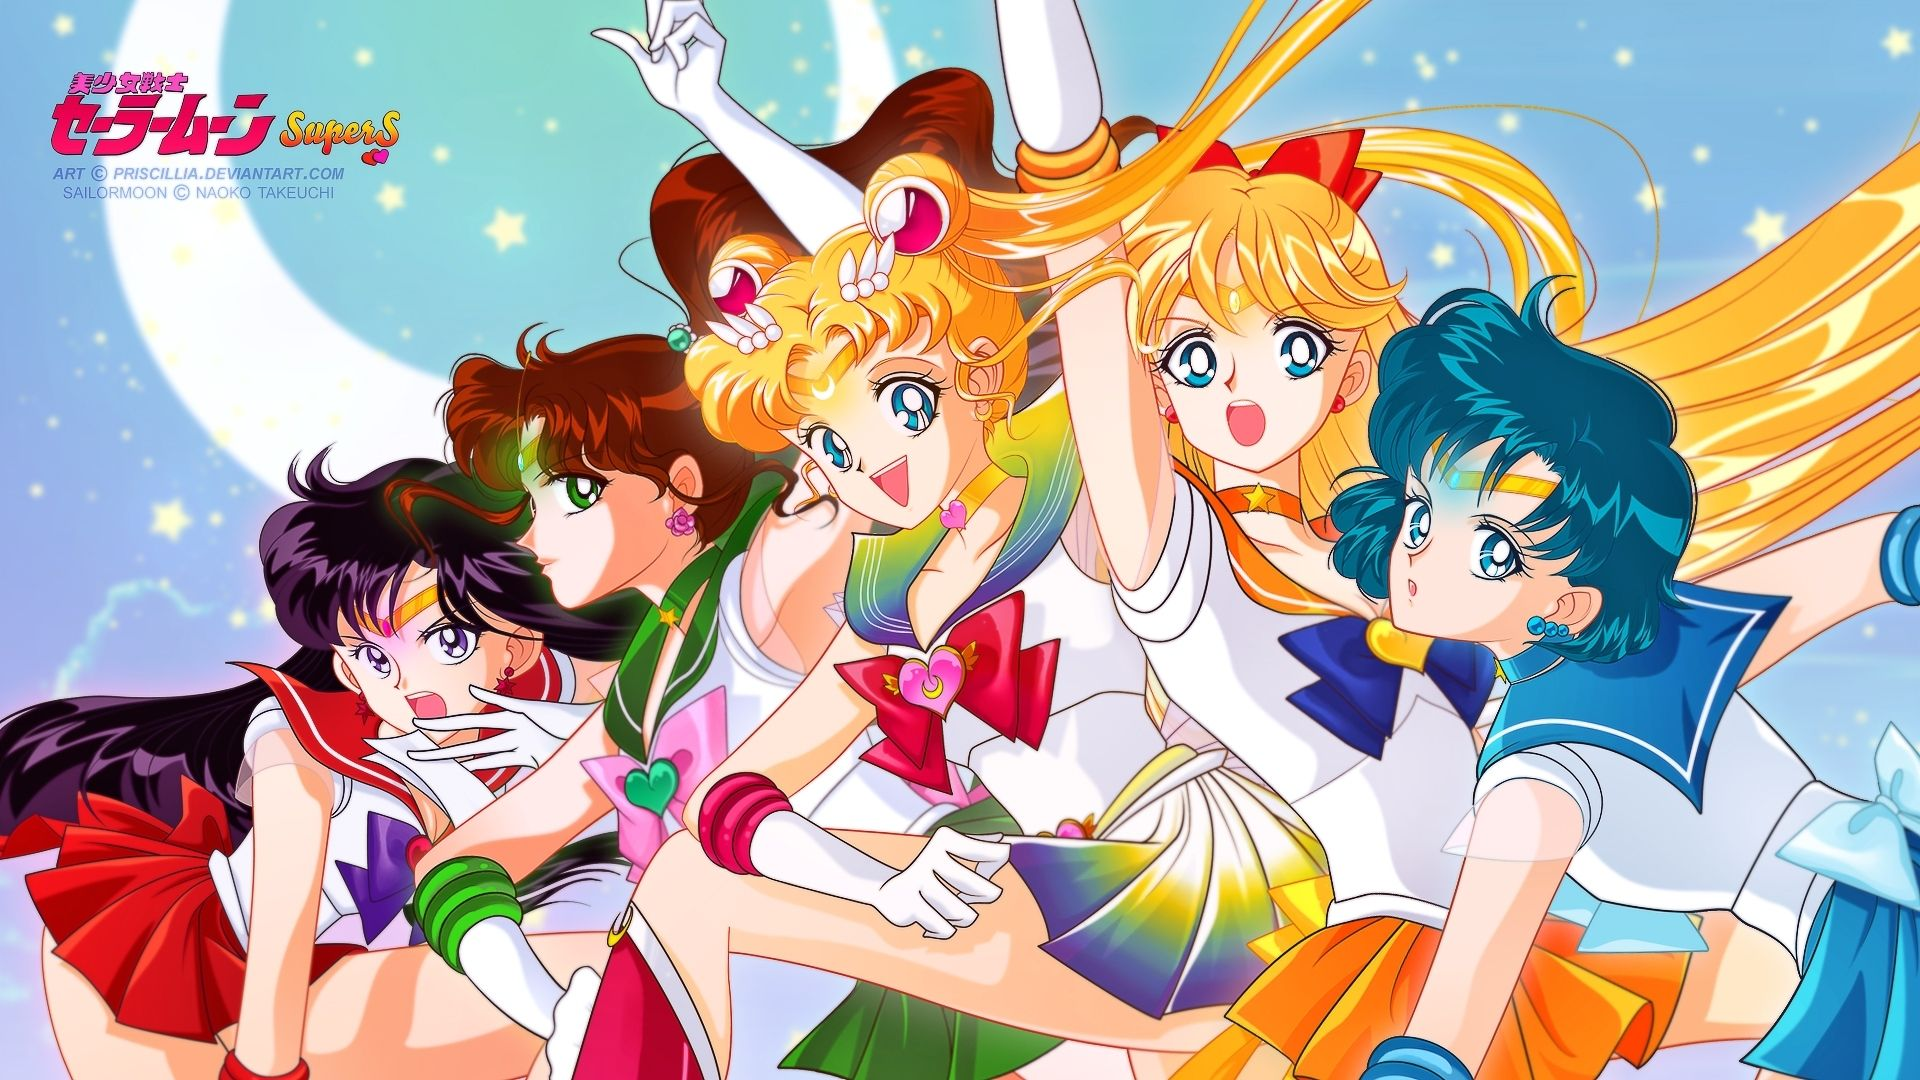 10 Most Popular Sailor Moon Wallpaper Desktop Full Hd 1080p For Pc Background 2019 Free Downlo Sailor Moon Wallpaper Sailor Moon Background Sailor Moon Fan Art High quality sailor moon hd wallpaper